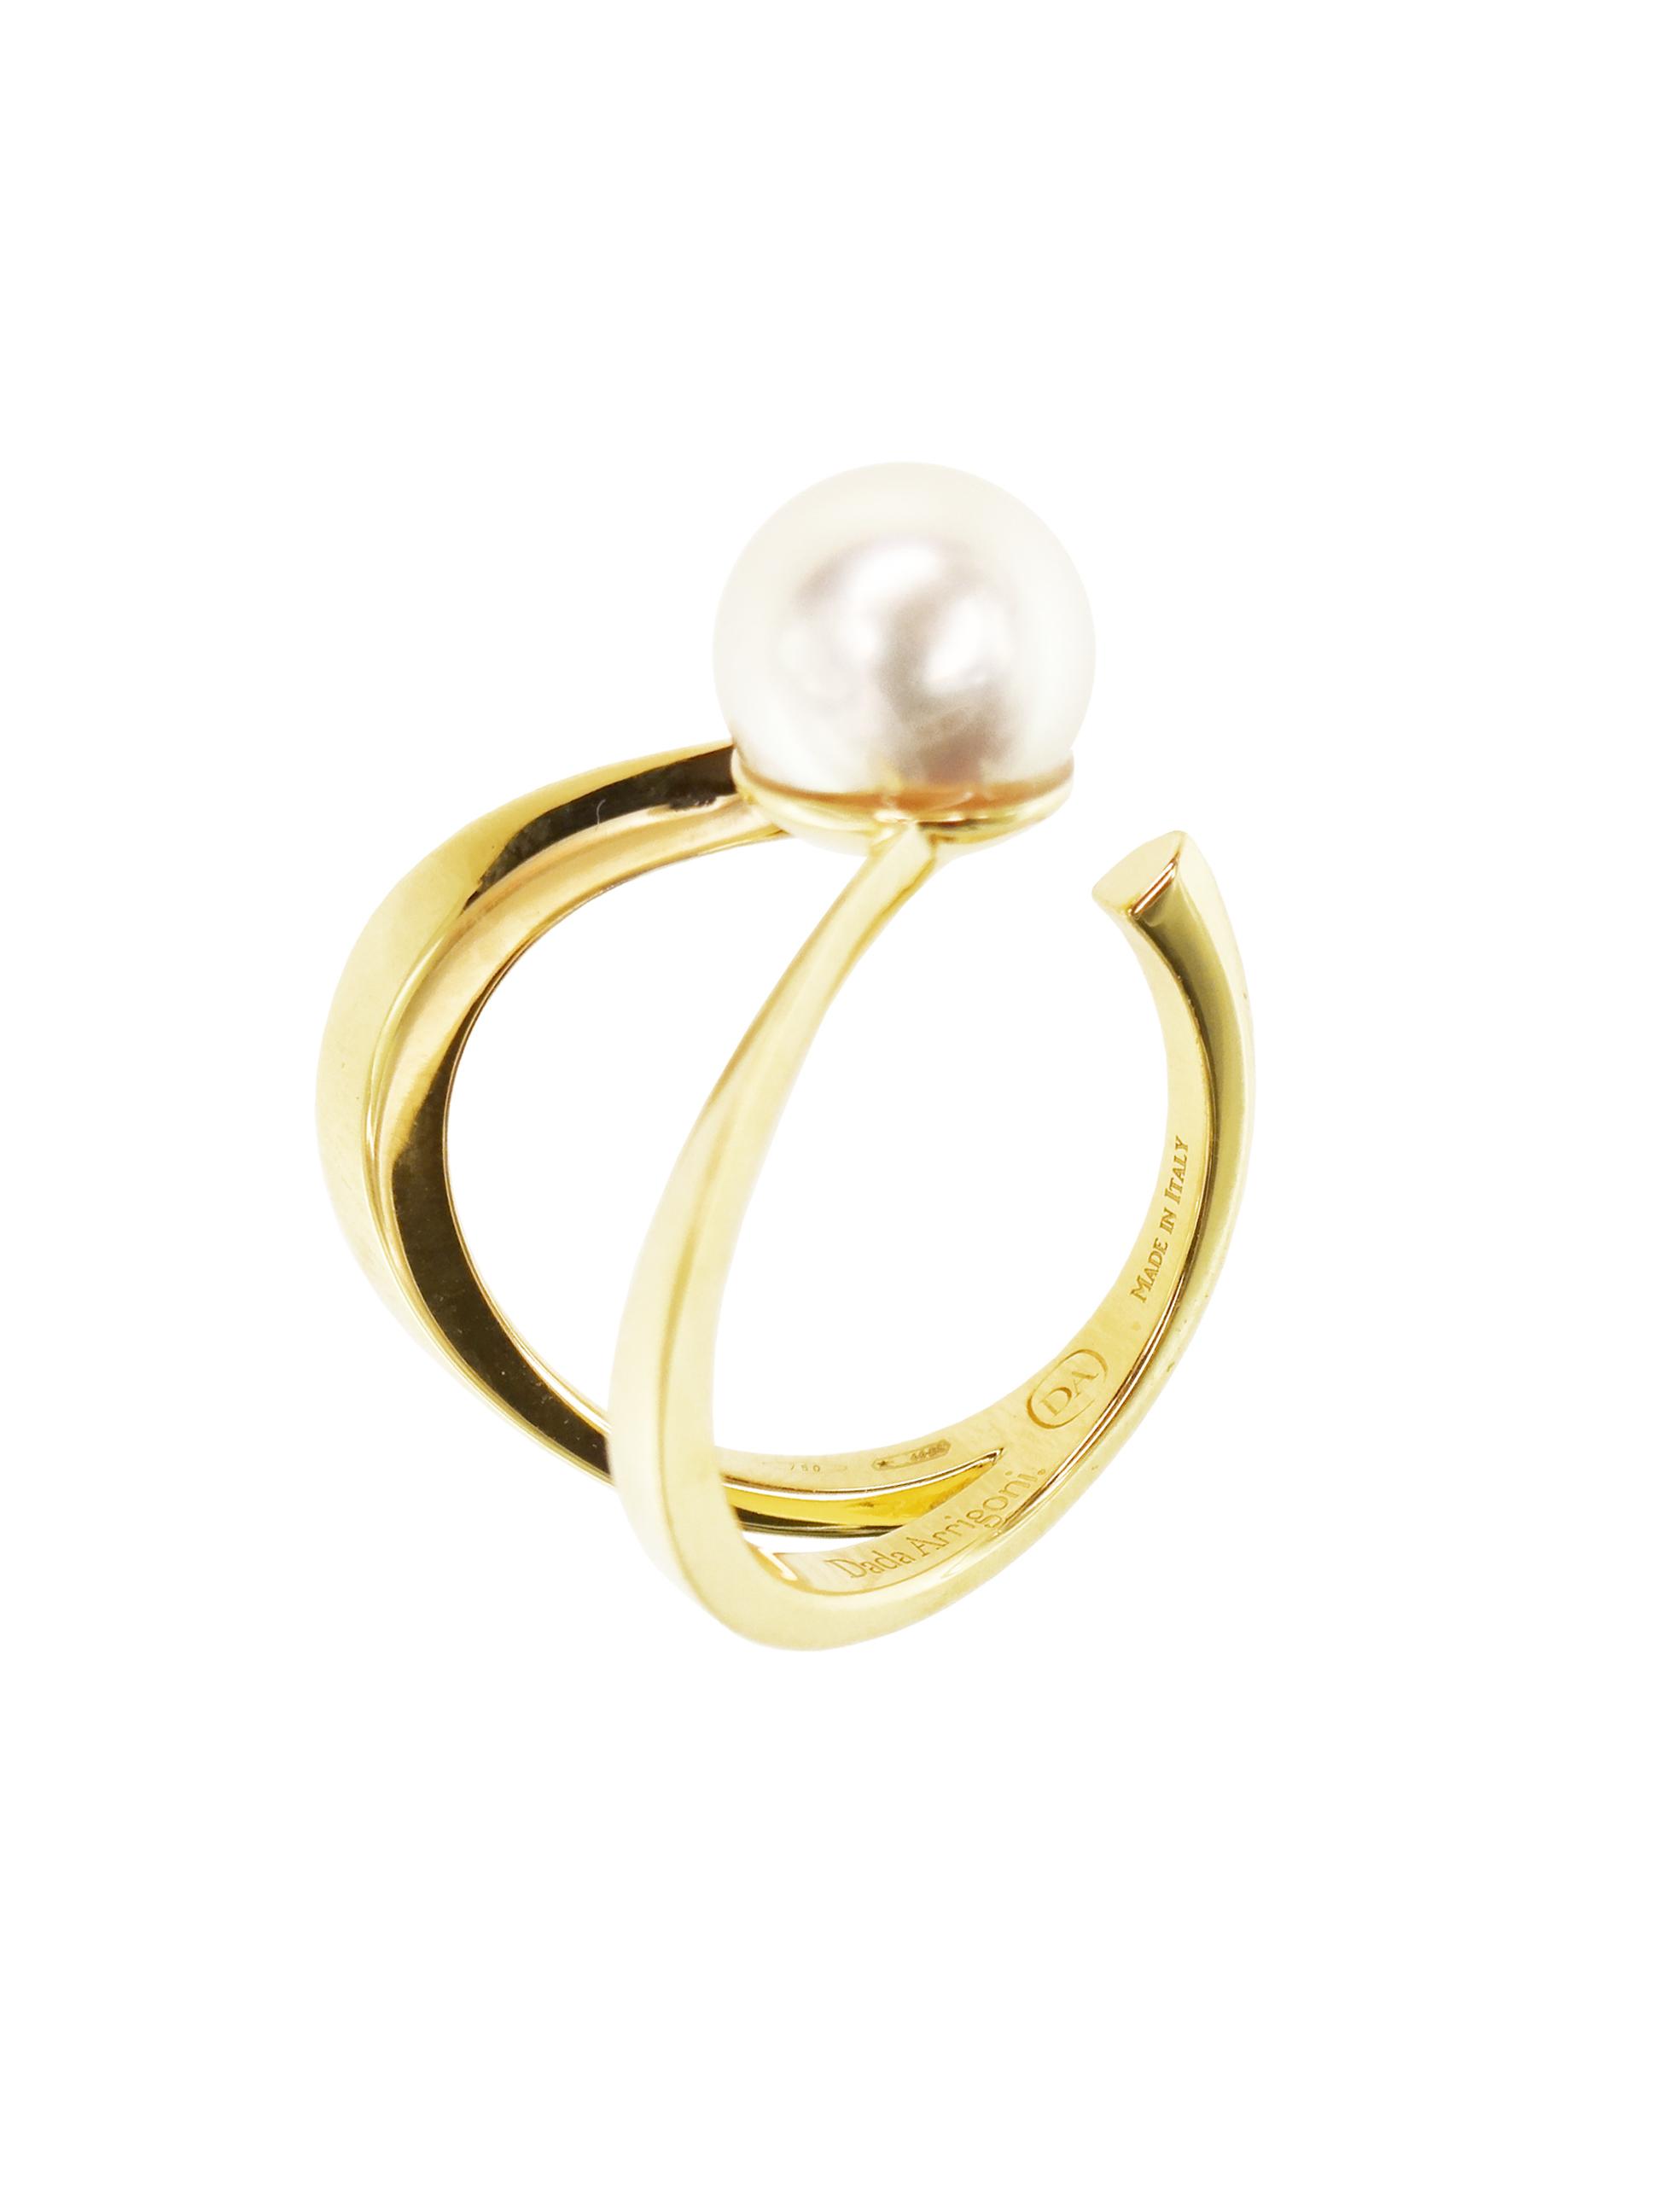 Anello in oro giallo con perla Akoya